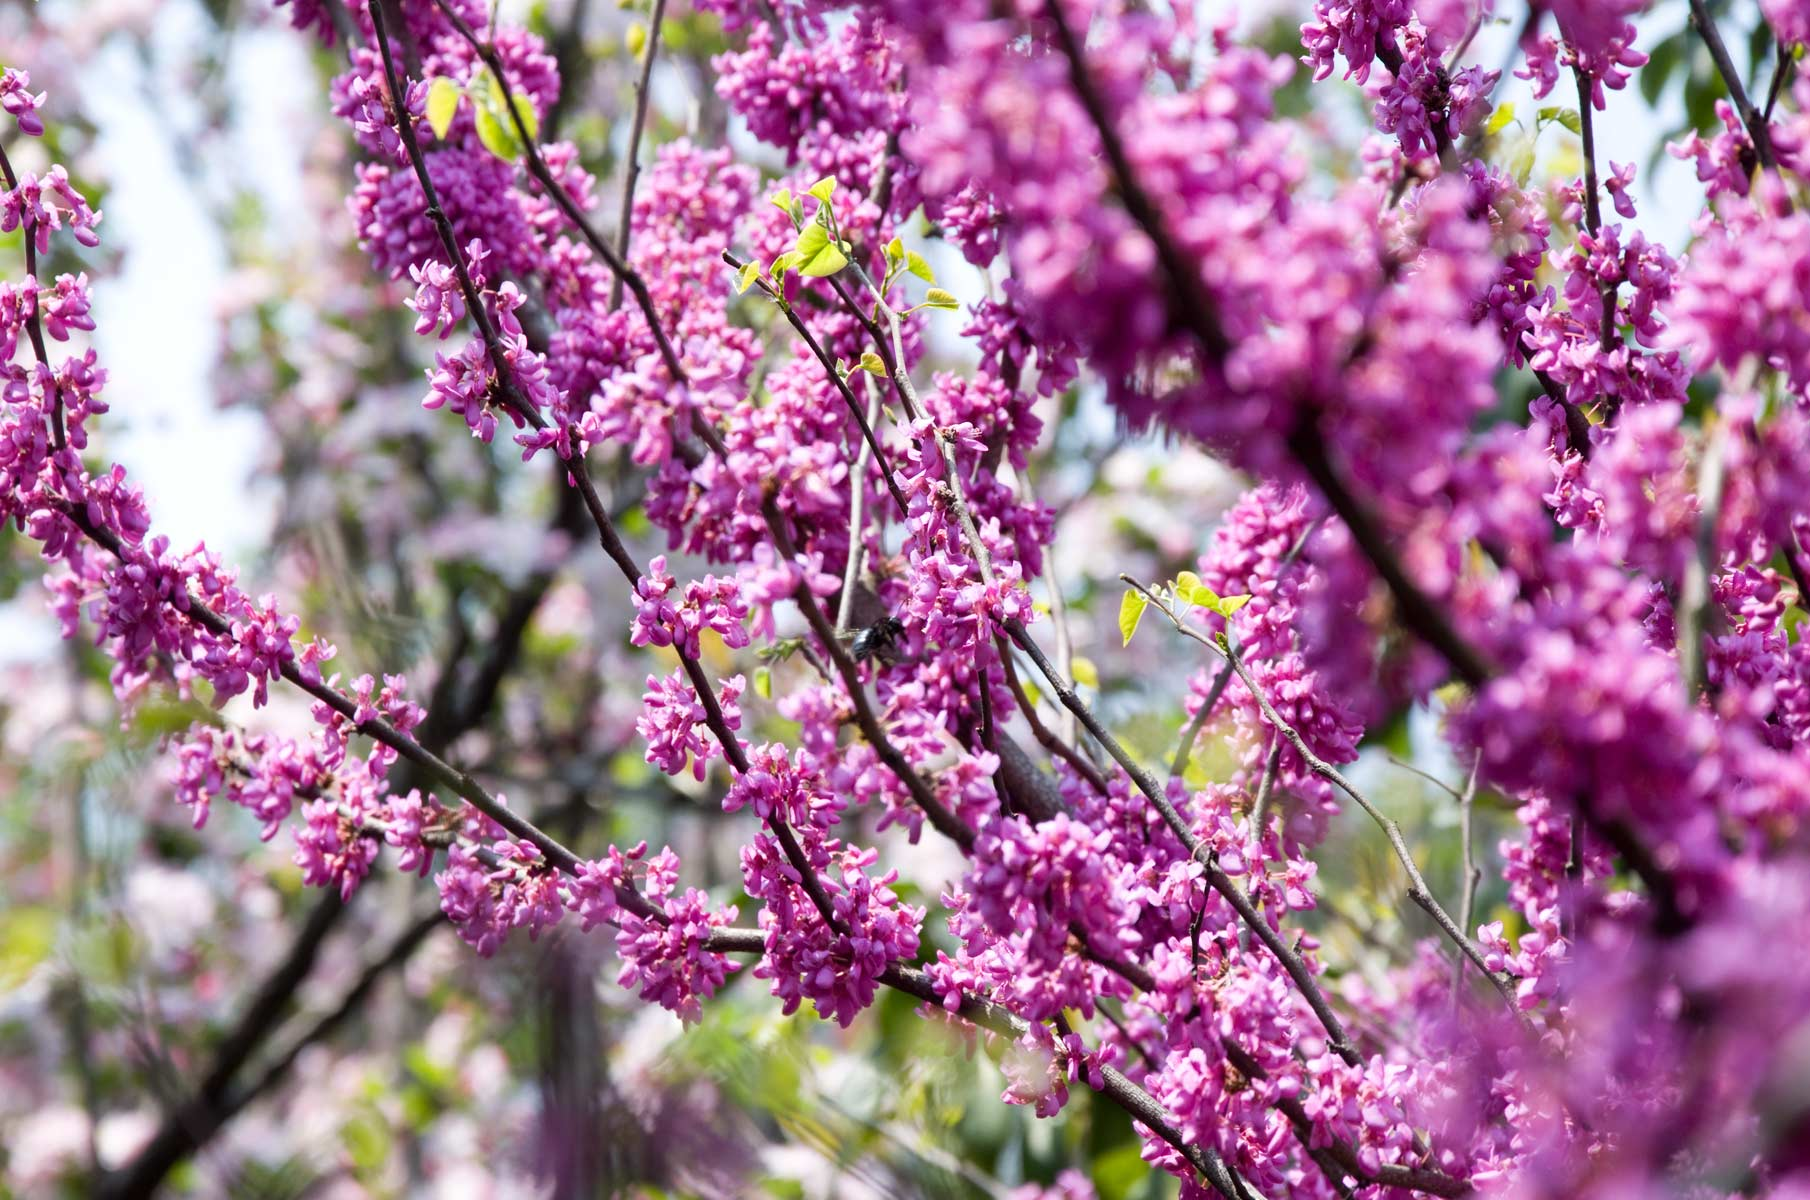 Blüten im Liu Garten in Suzhou, China